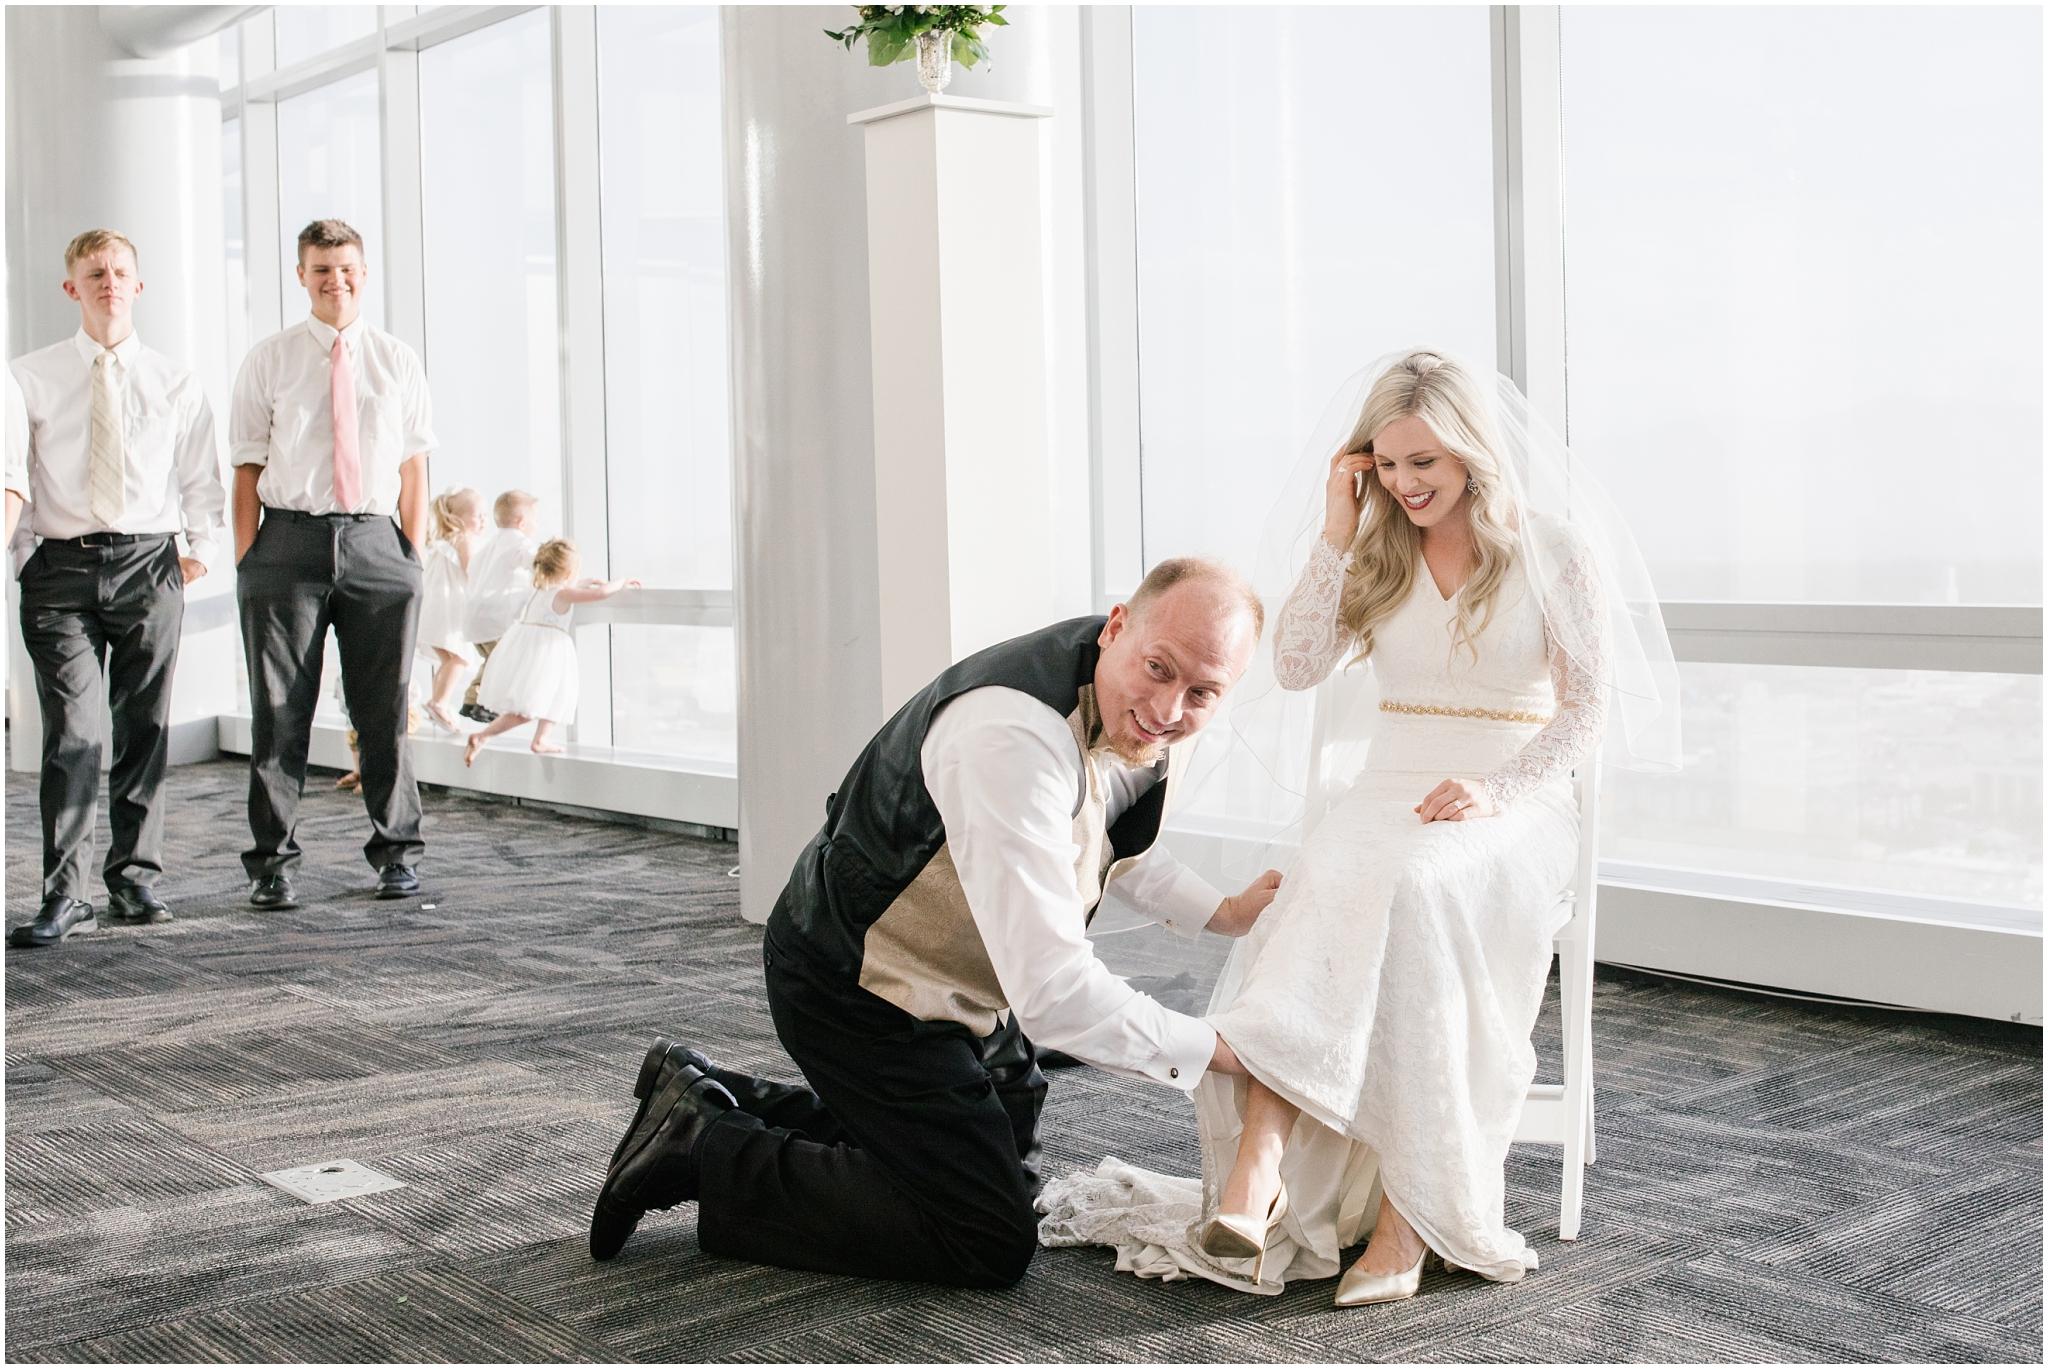 CherylandTyler-533_Lizzie-B-Imagery-Utah-Wedding-Photographer-Salt-Lake-City-Temple-Wells-Fargo-Building-Reception.jpg